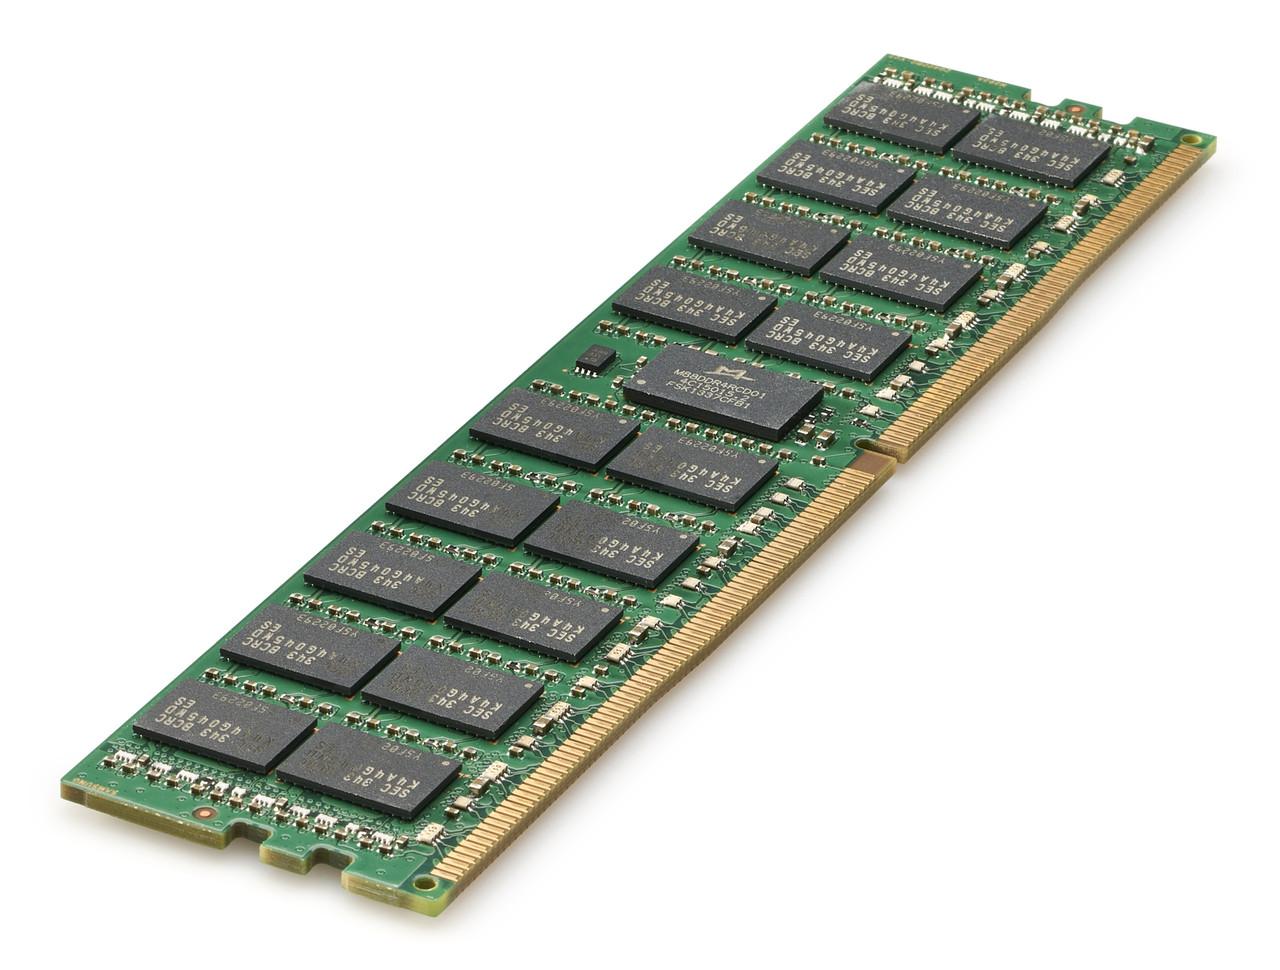 Модуль памяти P00920-B21 HPE 16GB (1x16GB) Single Rank x4 DDR4-2933 CAS-21-21-21 Registered Smart Memory Kit